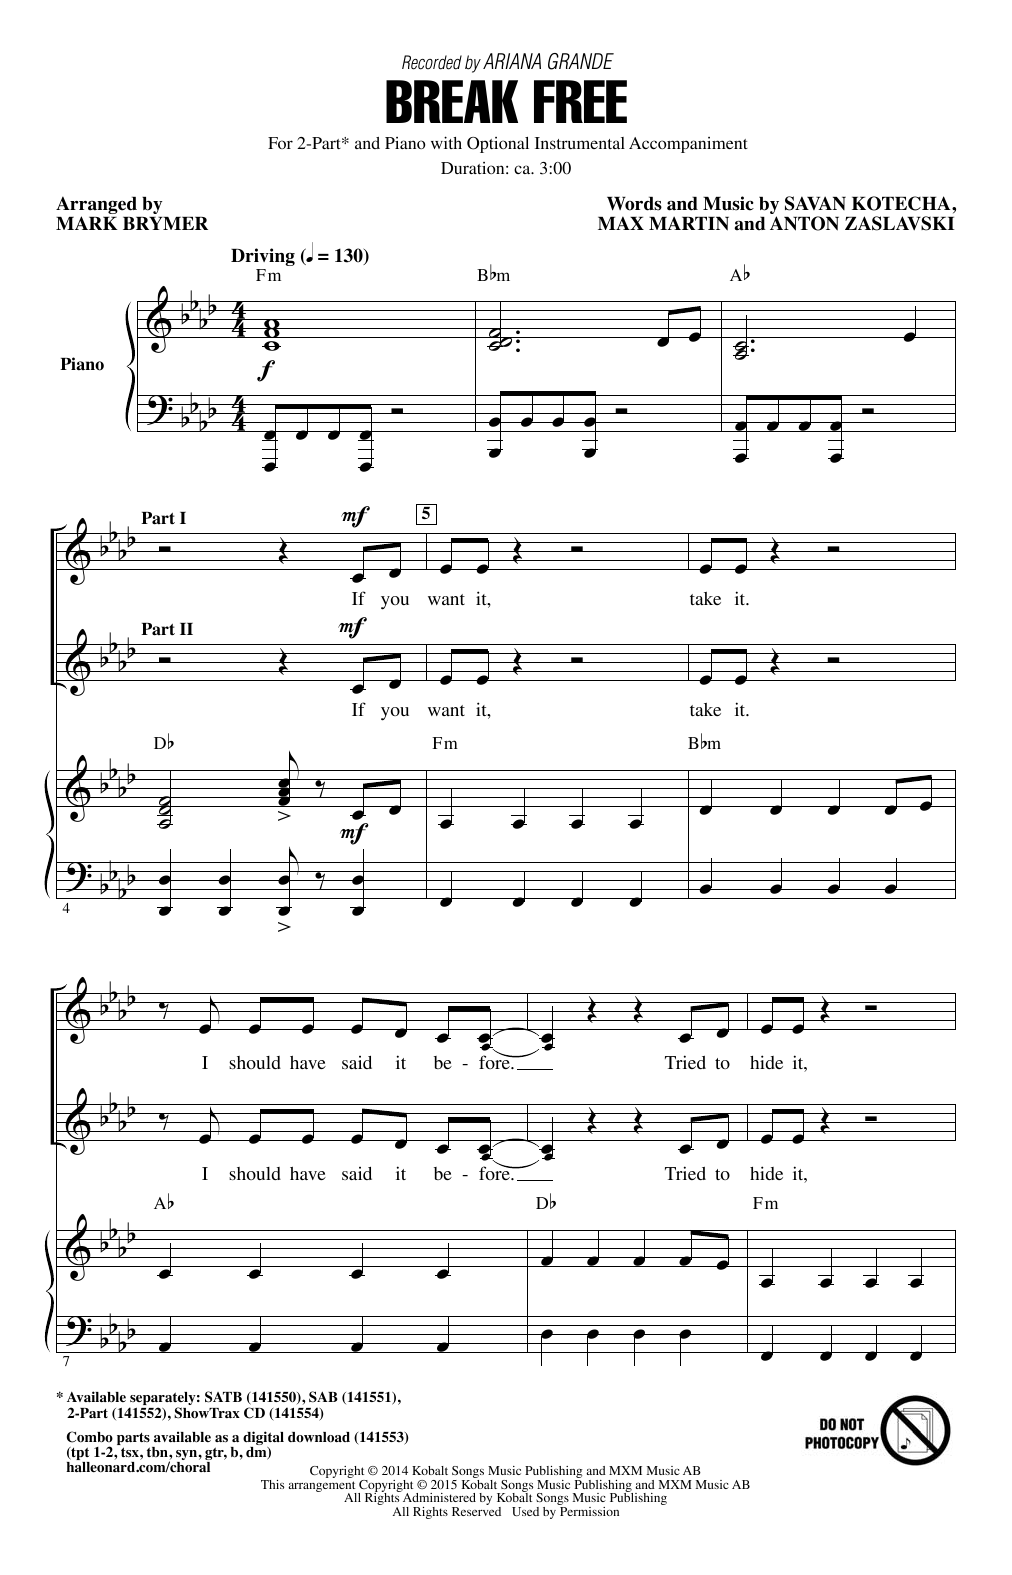 Ariana Grande Break Free (feat. Zedd) (arr. Mark Brymer) sheet music notes and chords. Download Printable PDF.